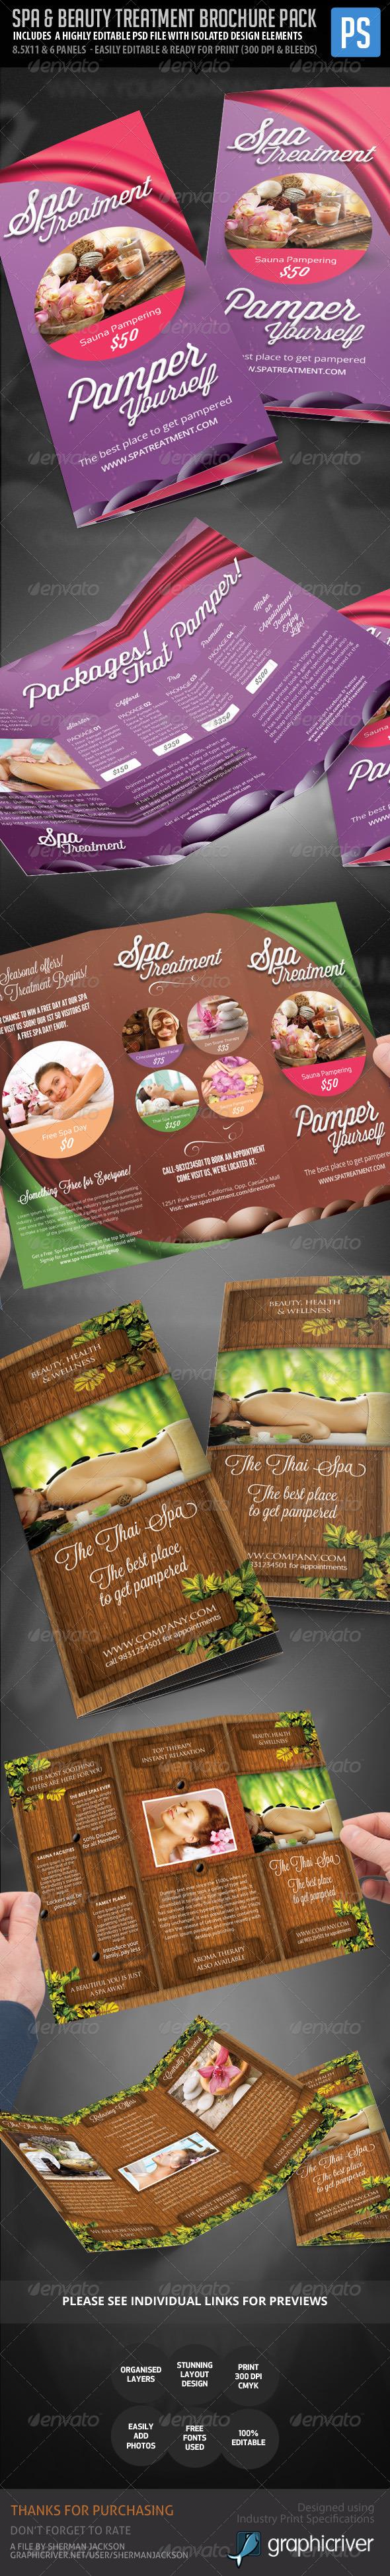 Spa Centre, Beauty & Wellness Brochure Pack - Corporate Brochures